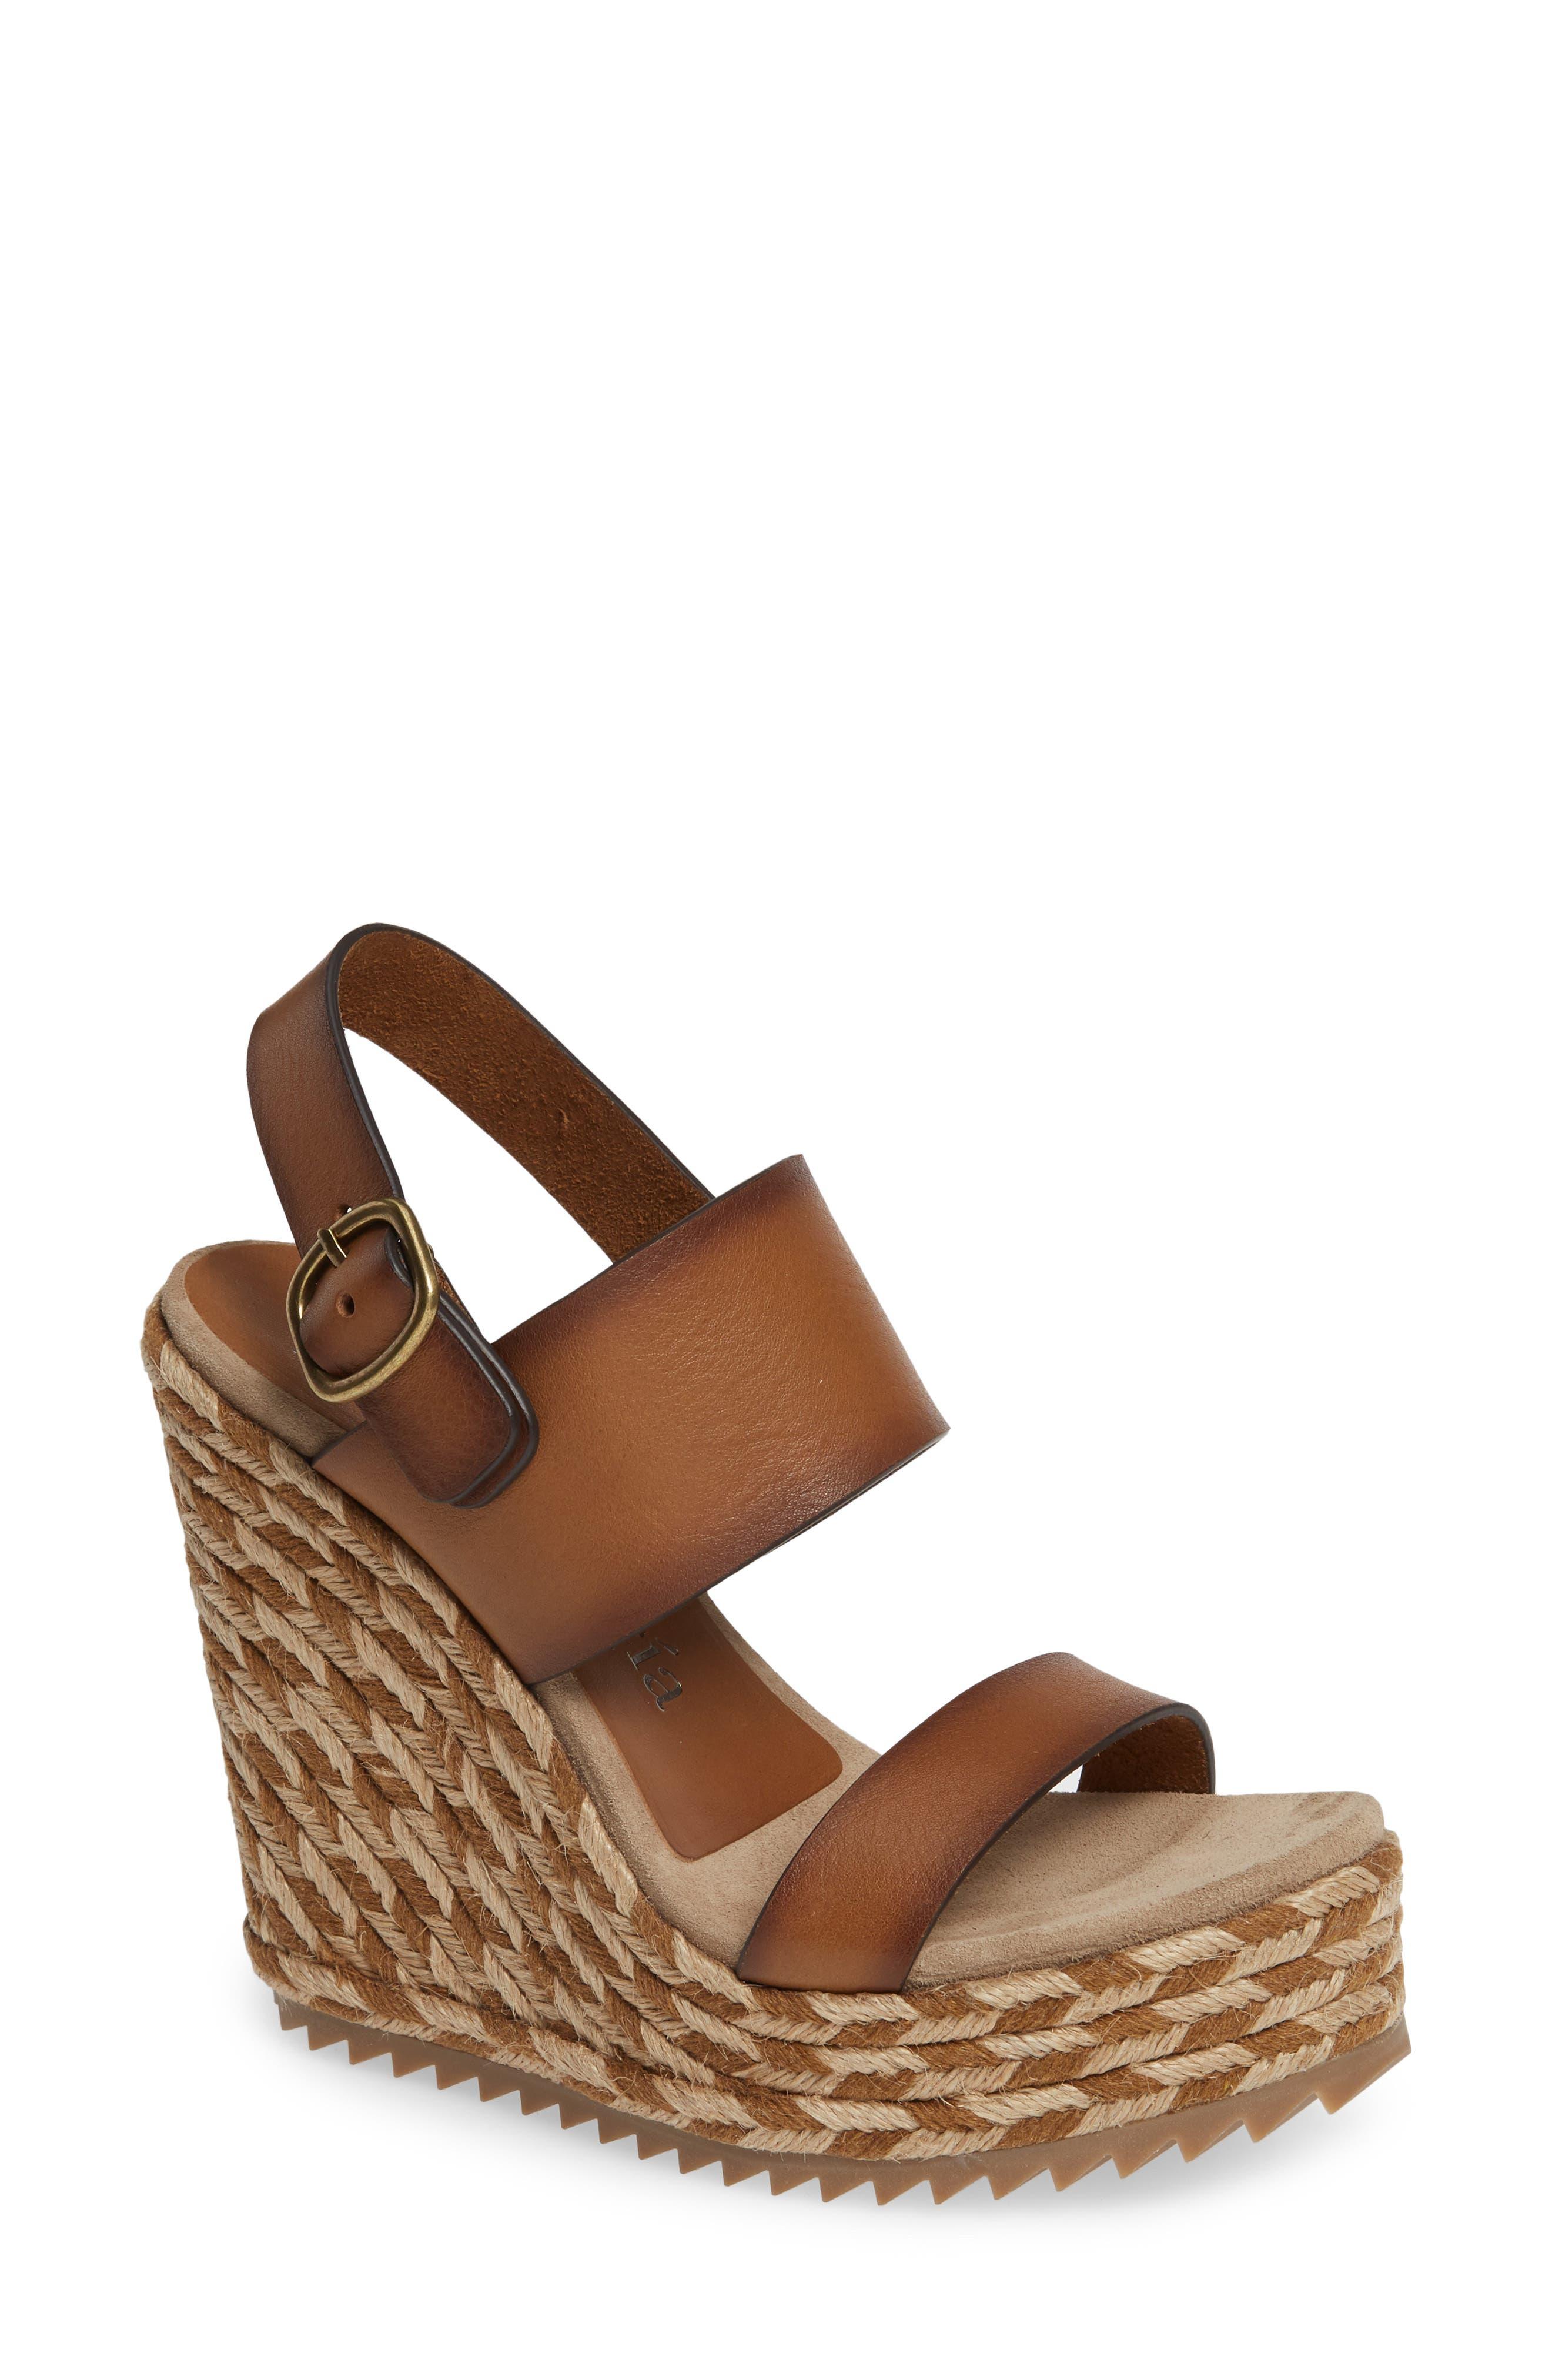 Tait Woven Wedge Sandal,                             Main thumbnail 1, color,                             CIGAR VACCHETTA